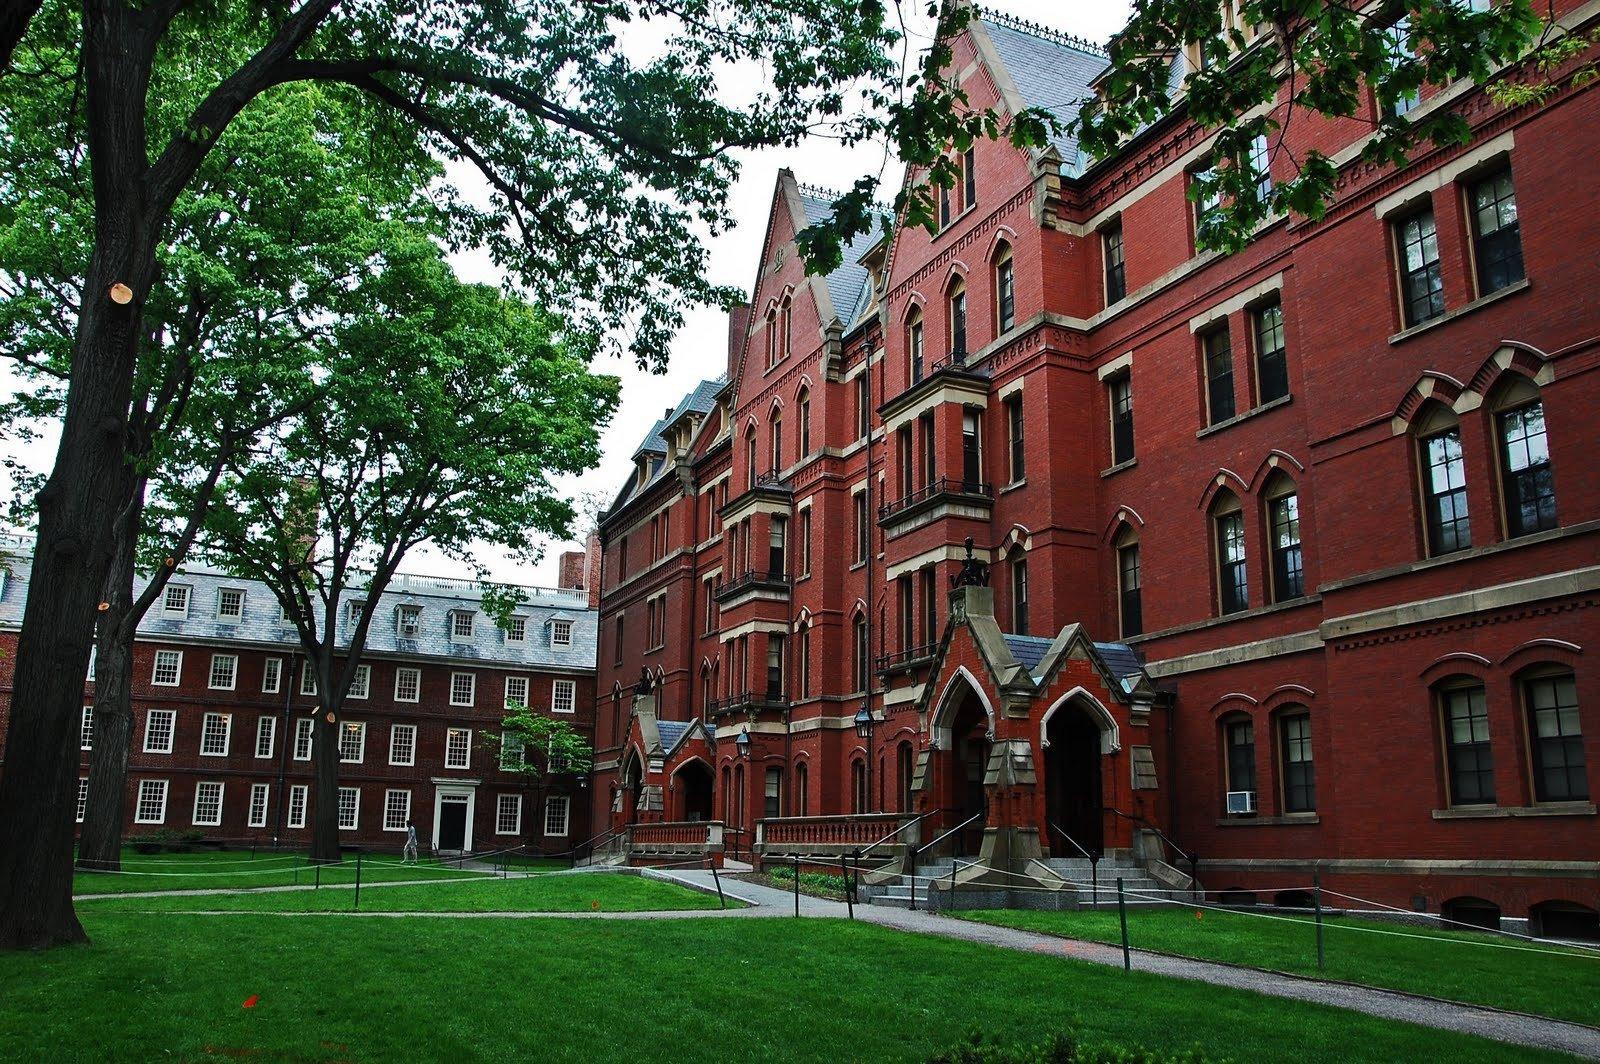 If you go to Harvard University?